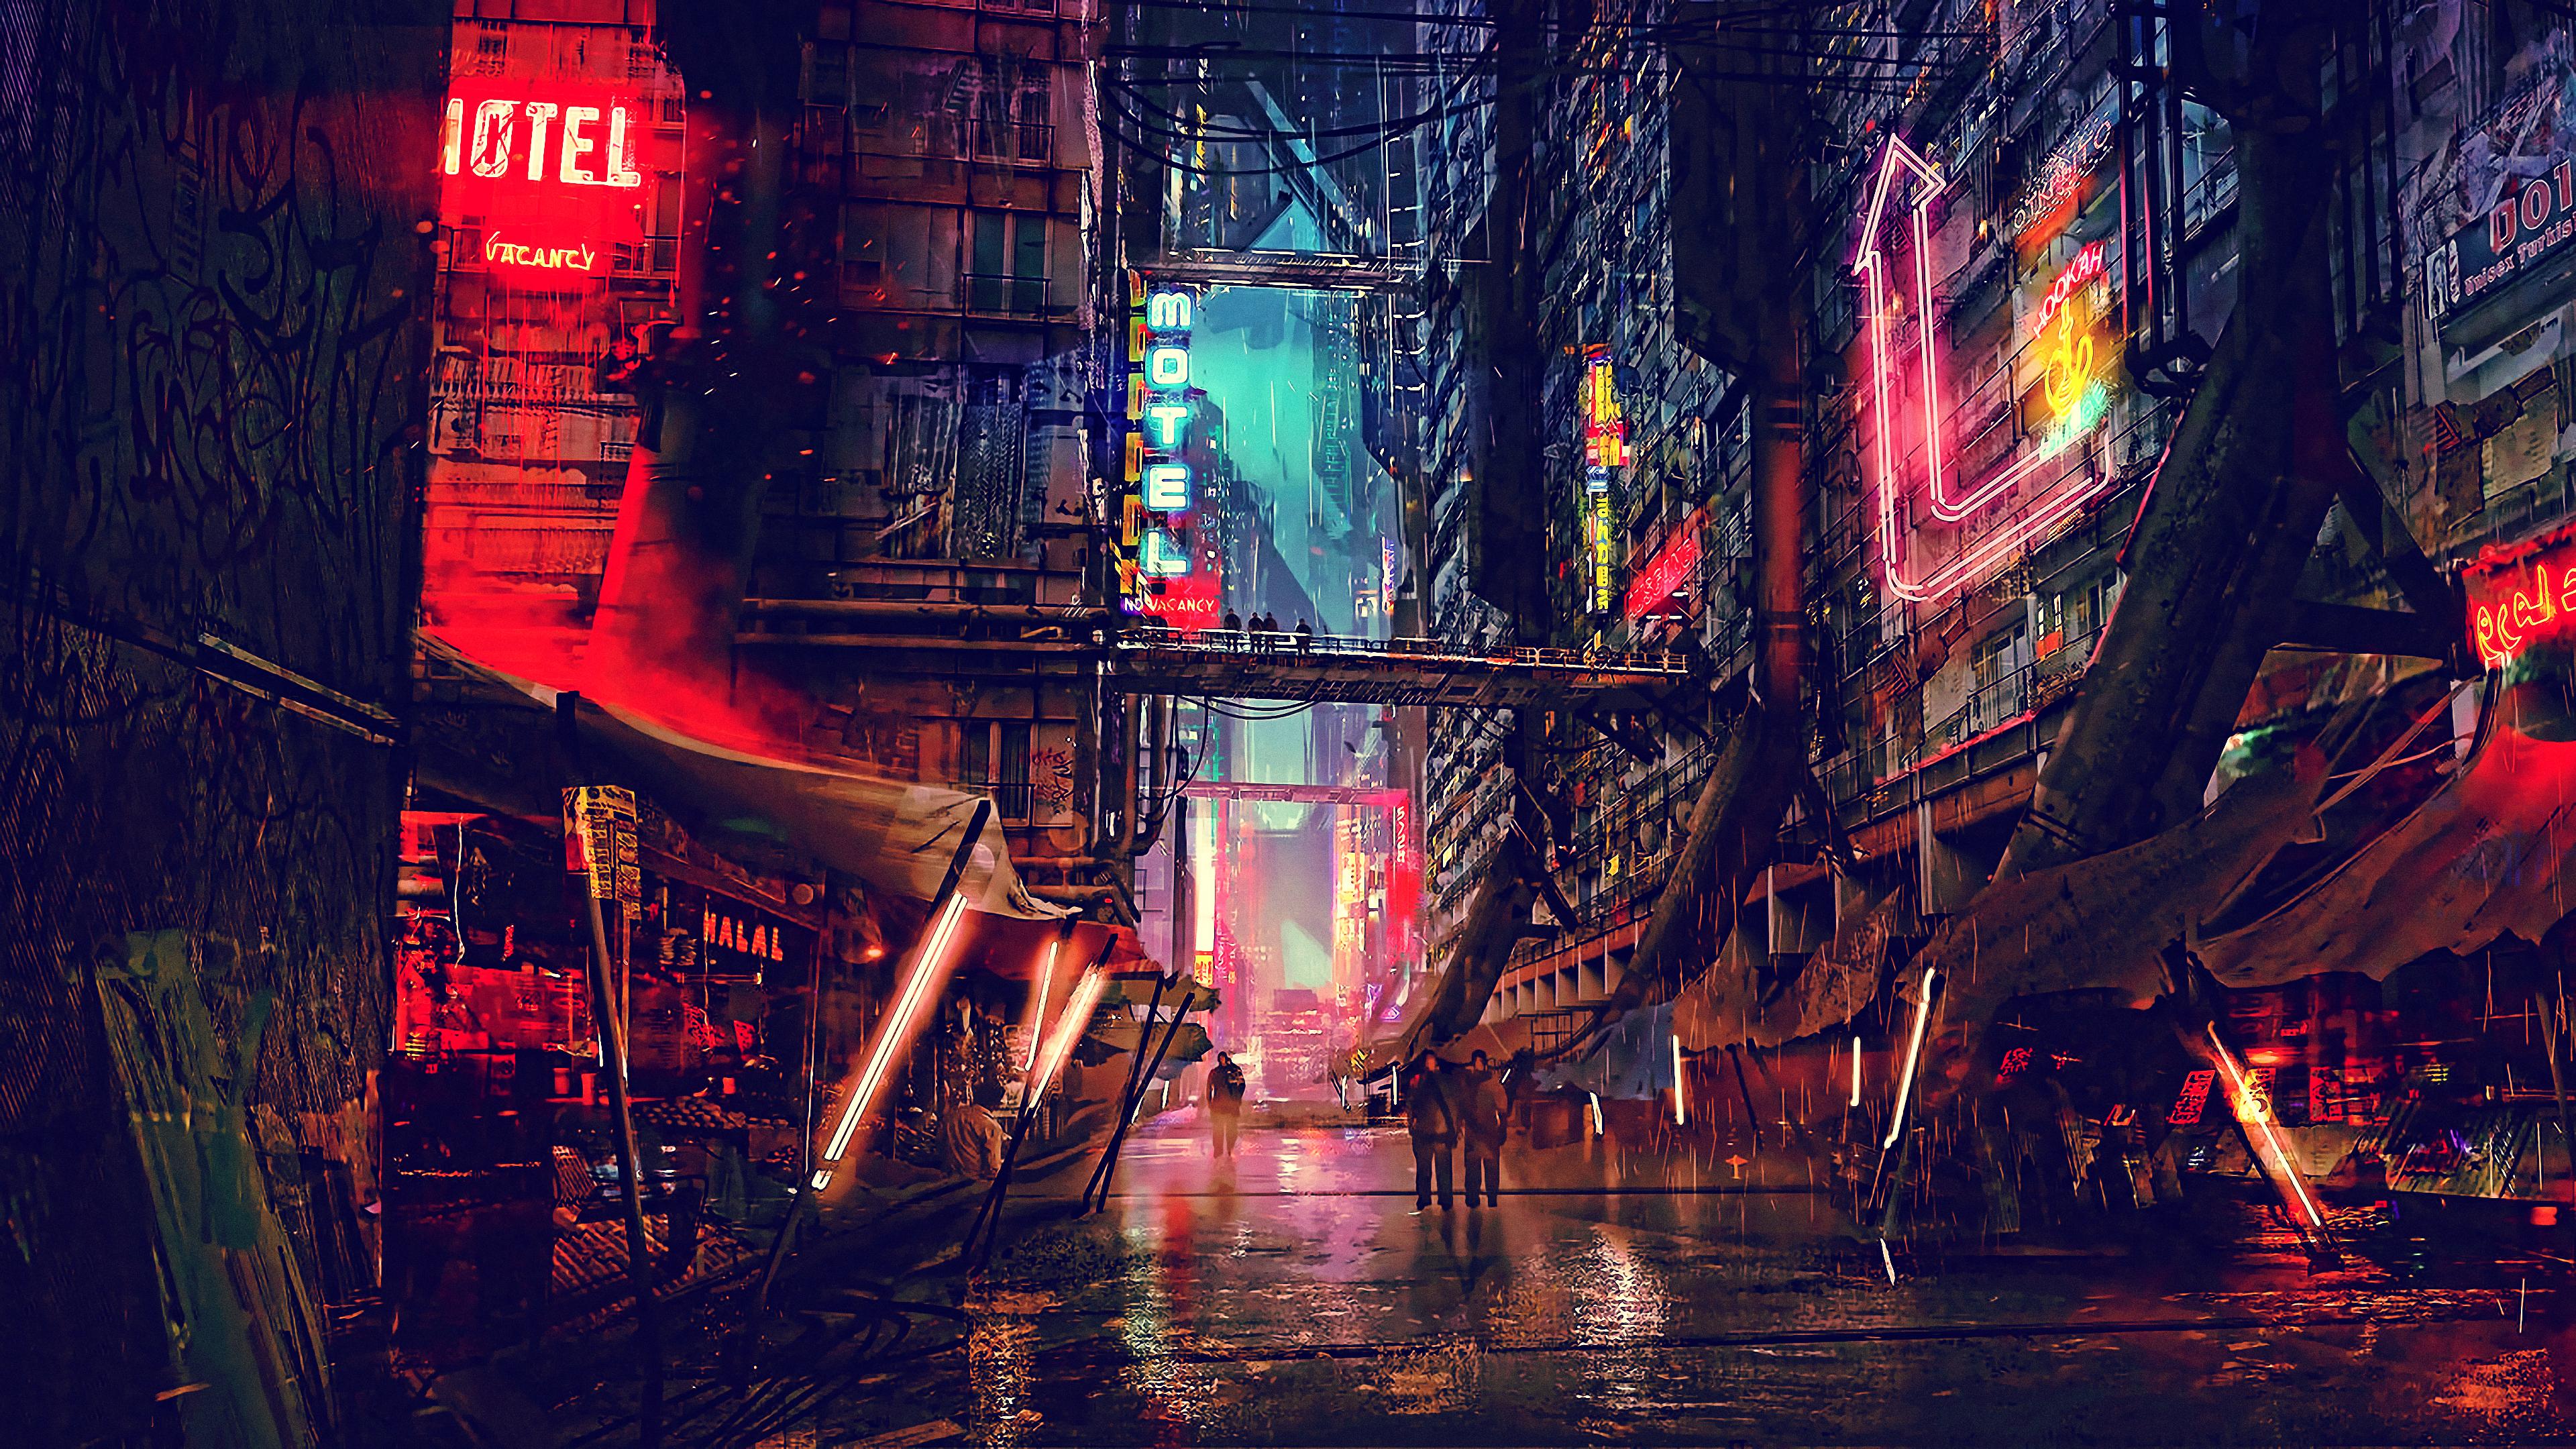 Science Fiction Cyberpunk Futuristic City Digital Art 4k ...